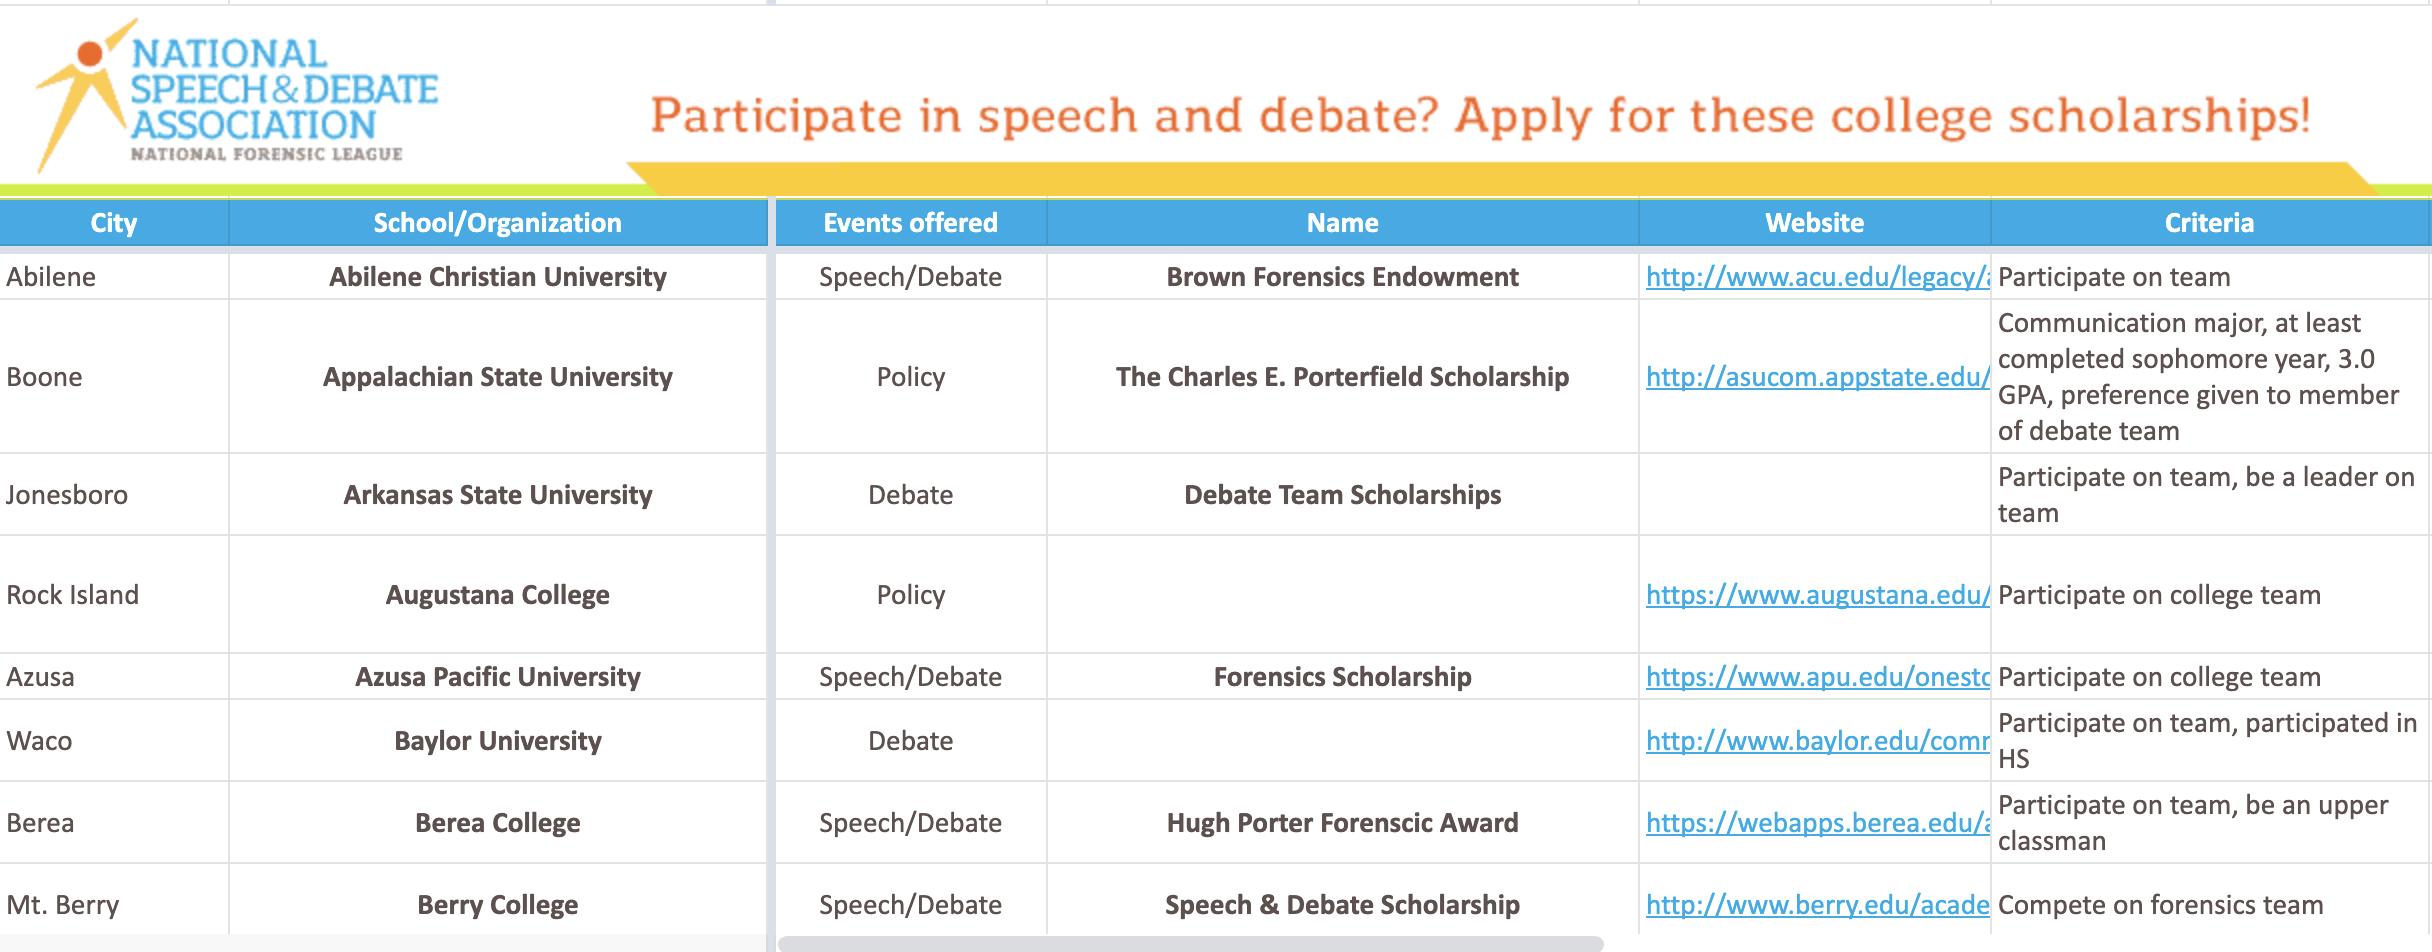 Spreadsheet of speech and debate team scholarships